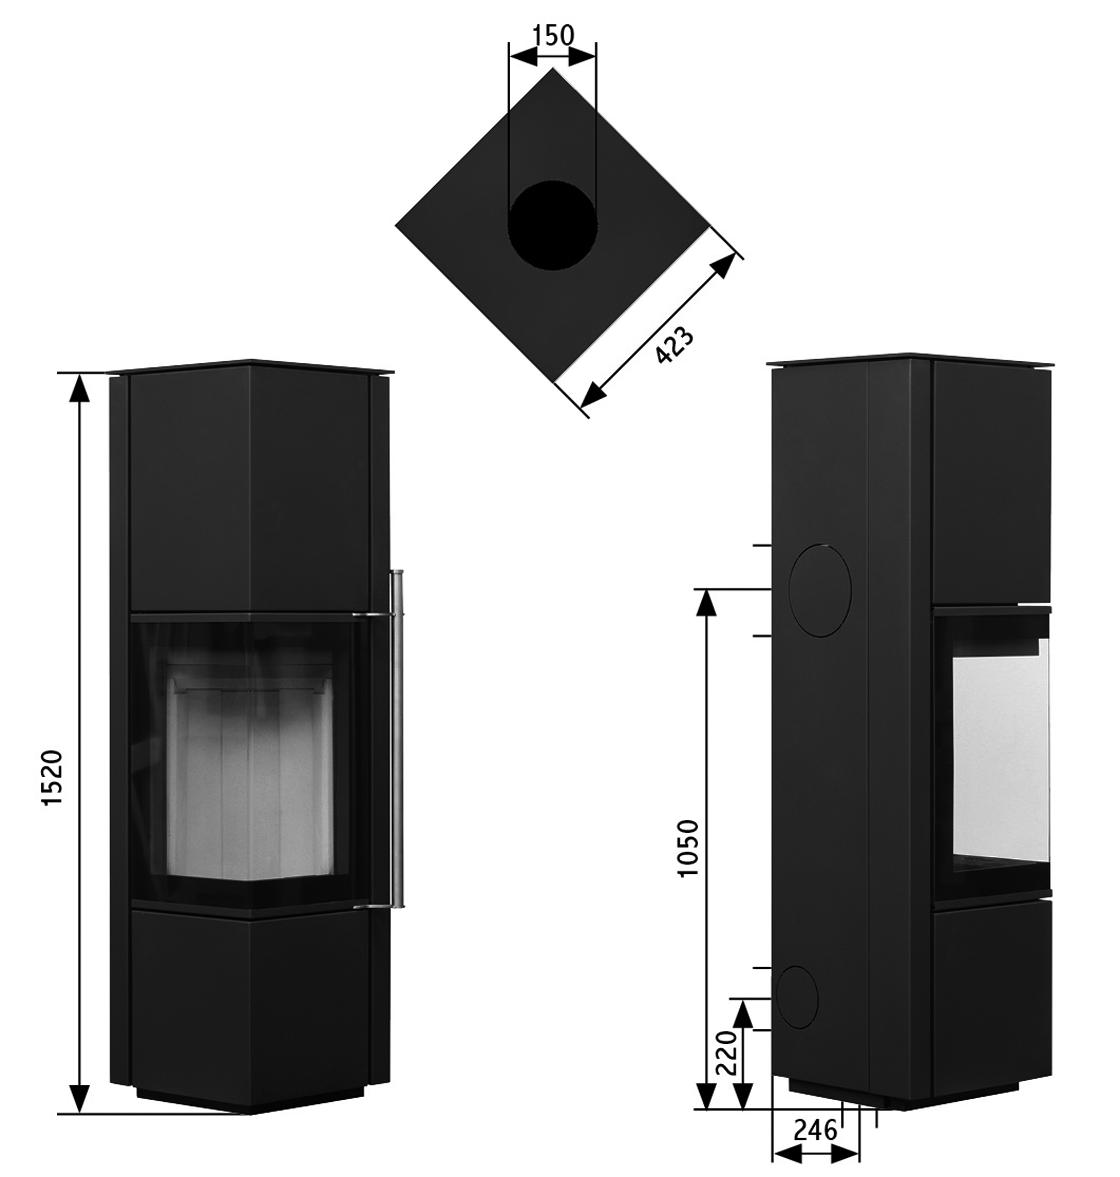 po les bois canto ams fonte flamme. Black Bedroom Furniture Sets. Home Design Ideas